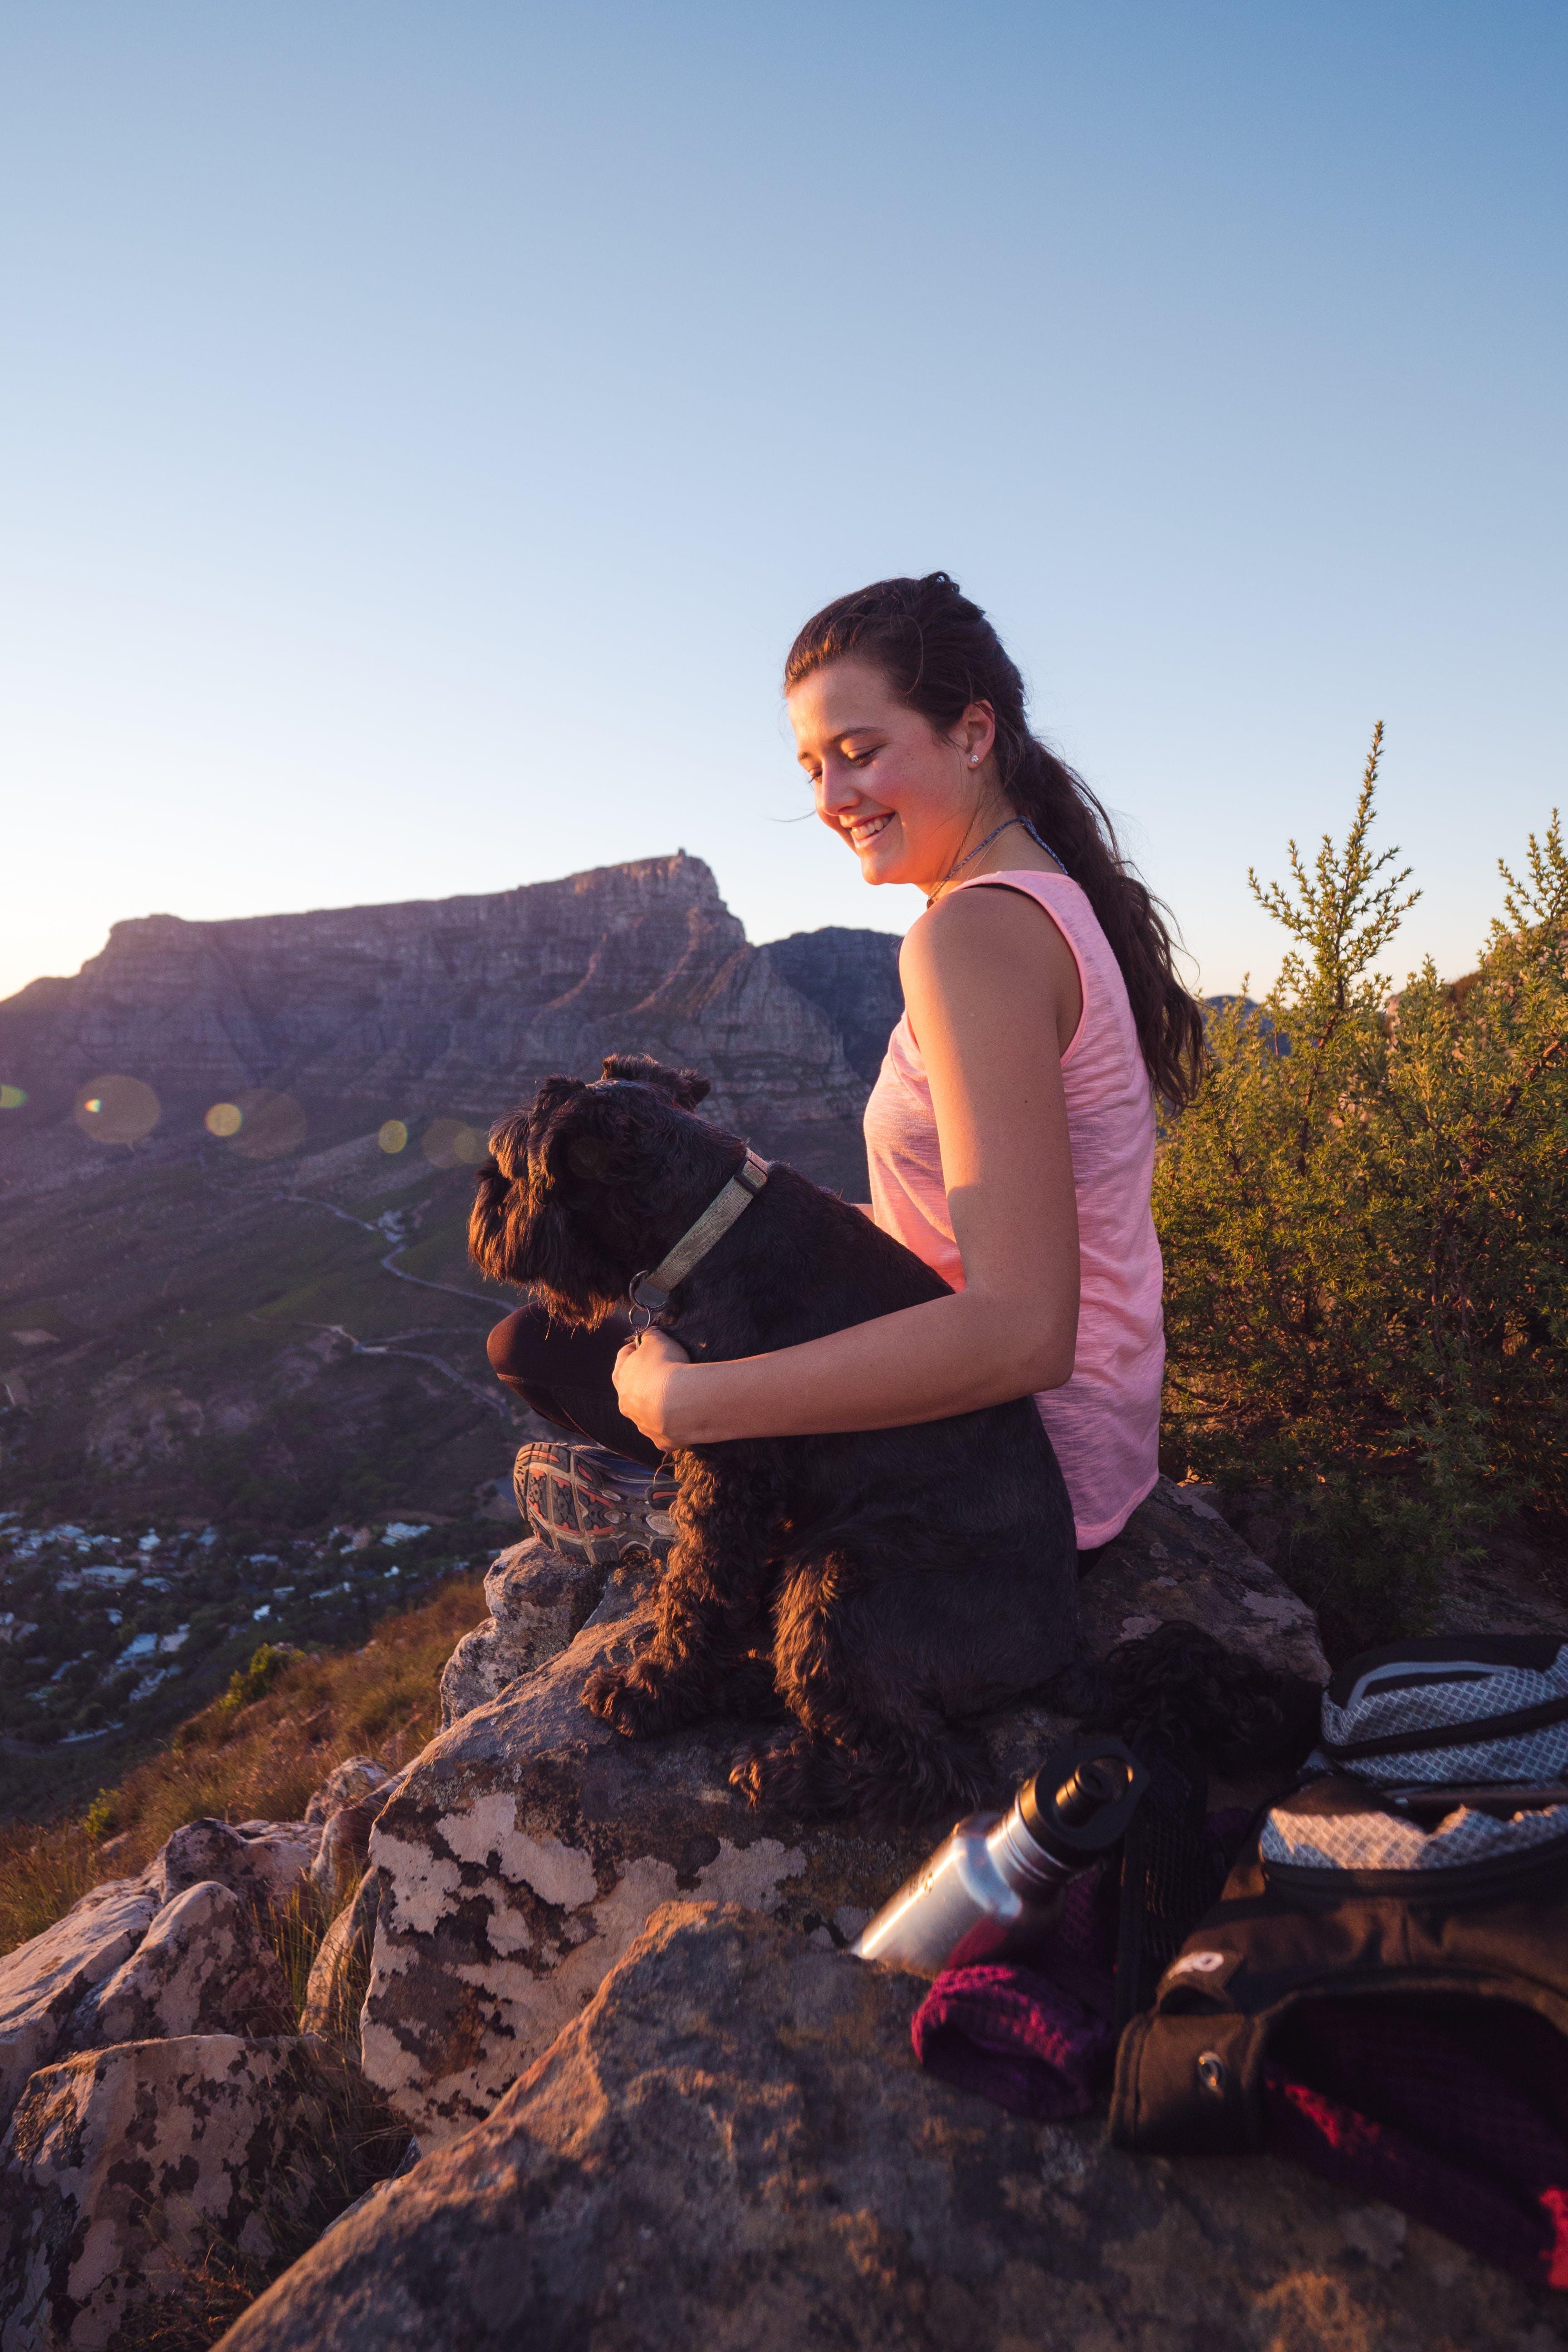 Woman Wearing Pink Tank Top Sitting on Rock Beside Dog